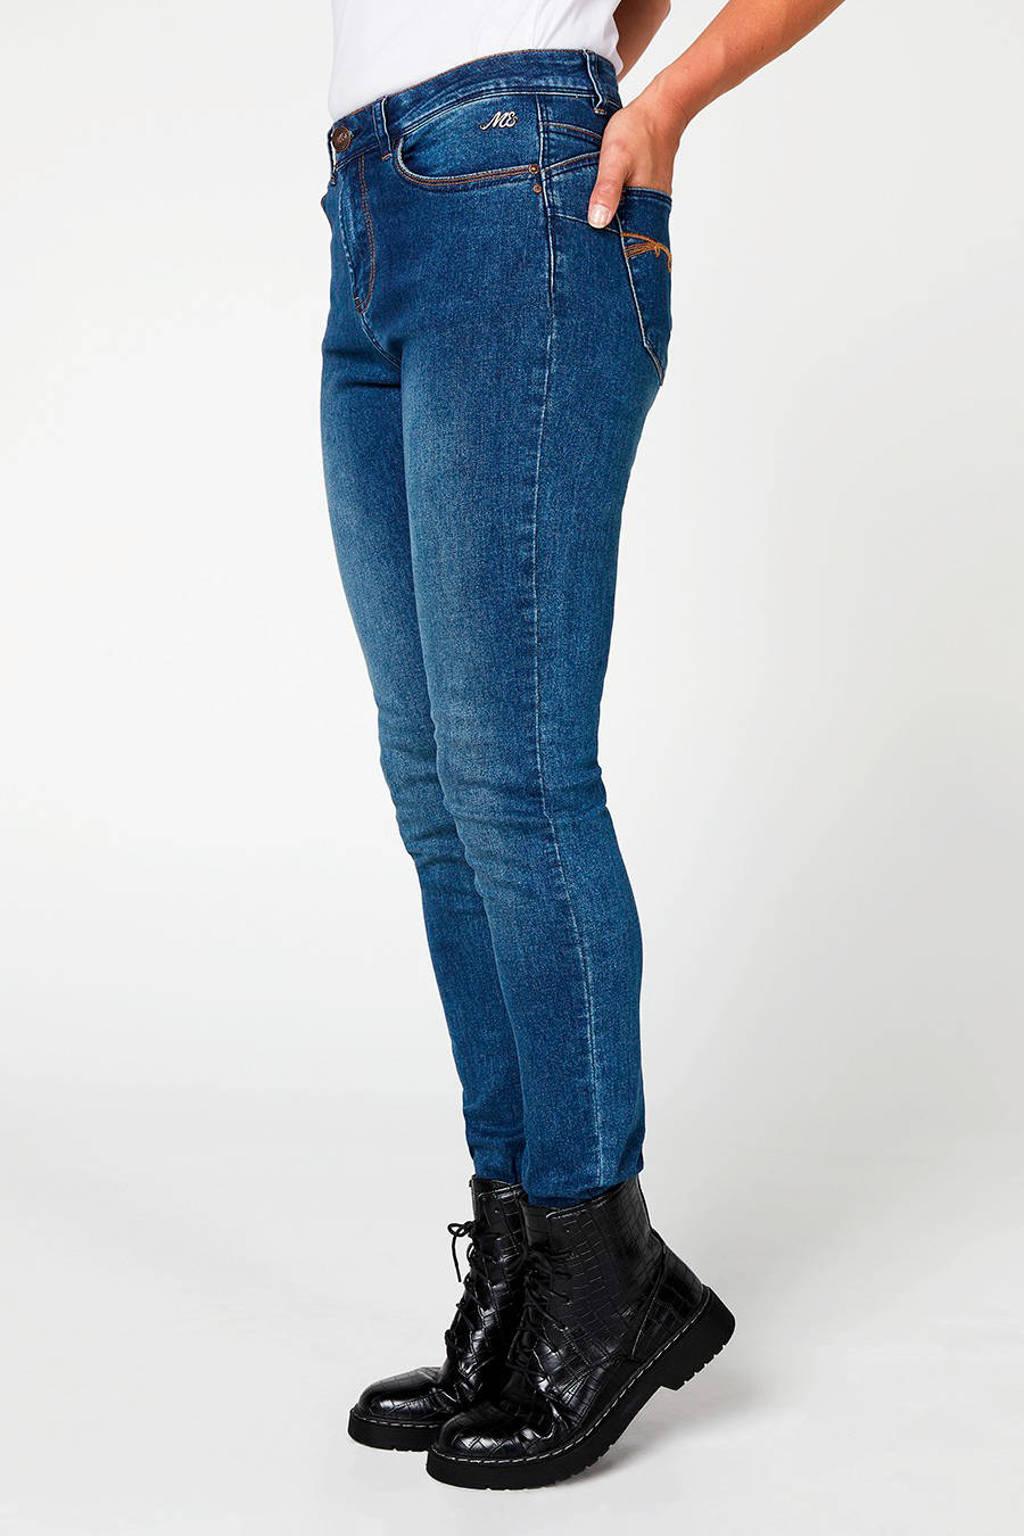 Miss Etam Regulier push up slim fit jeans 32 inch, Blauw